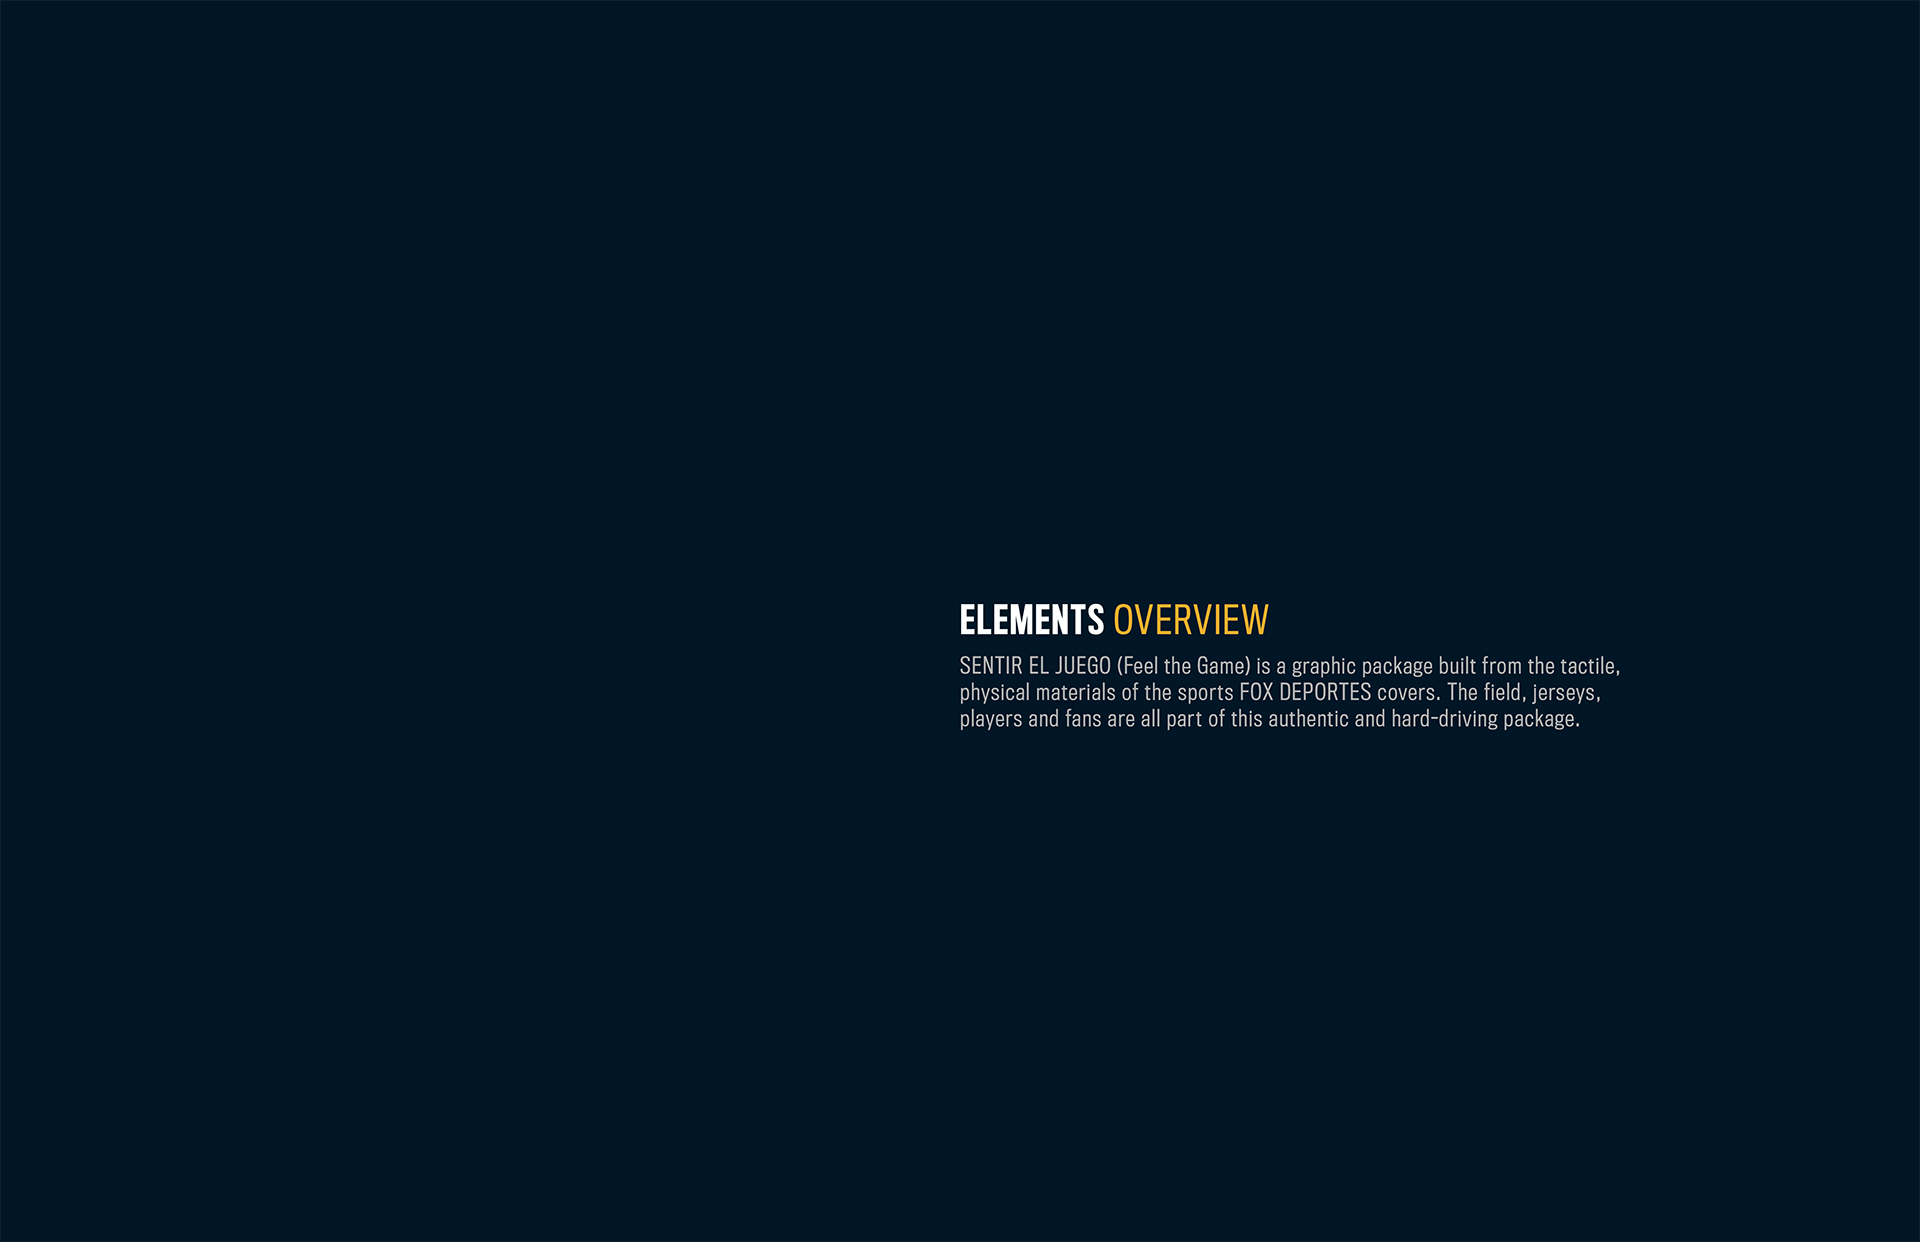 FOX_DEPORTES_Element_Guide_072314-3.jpg